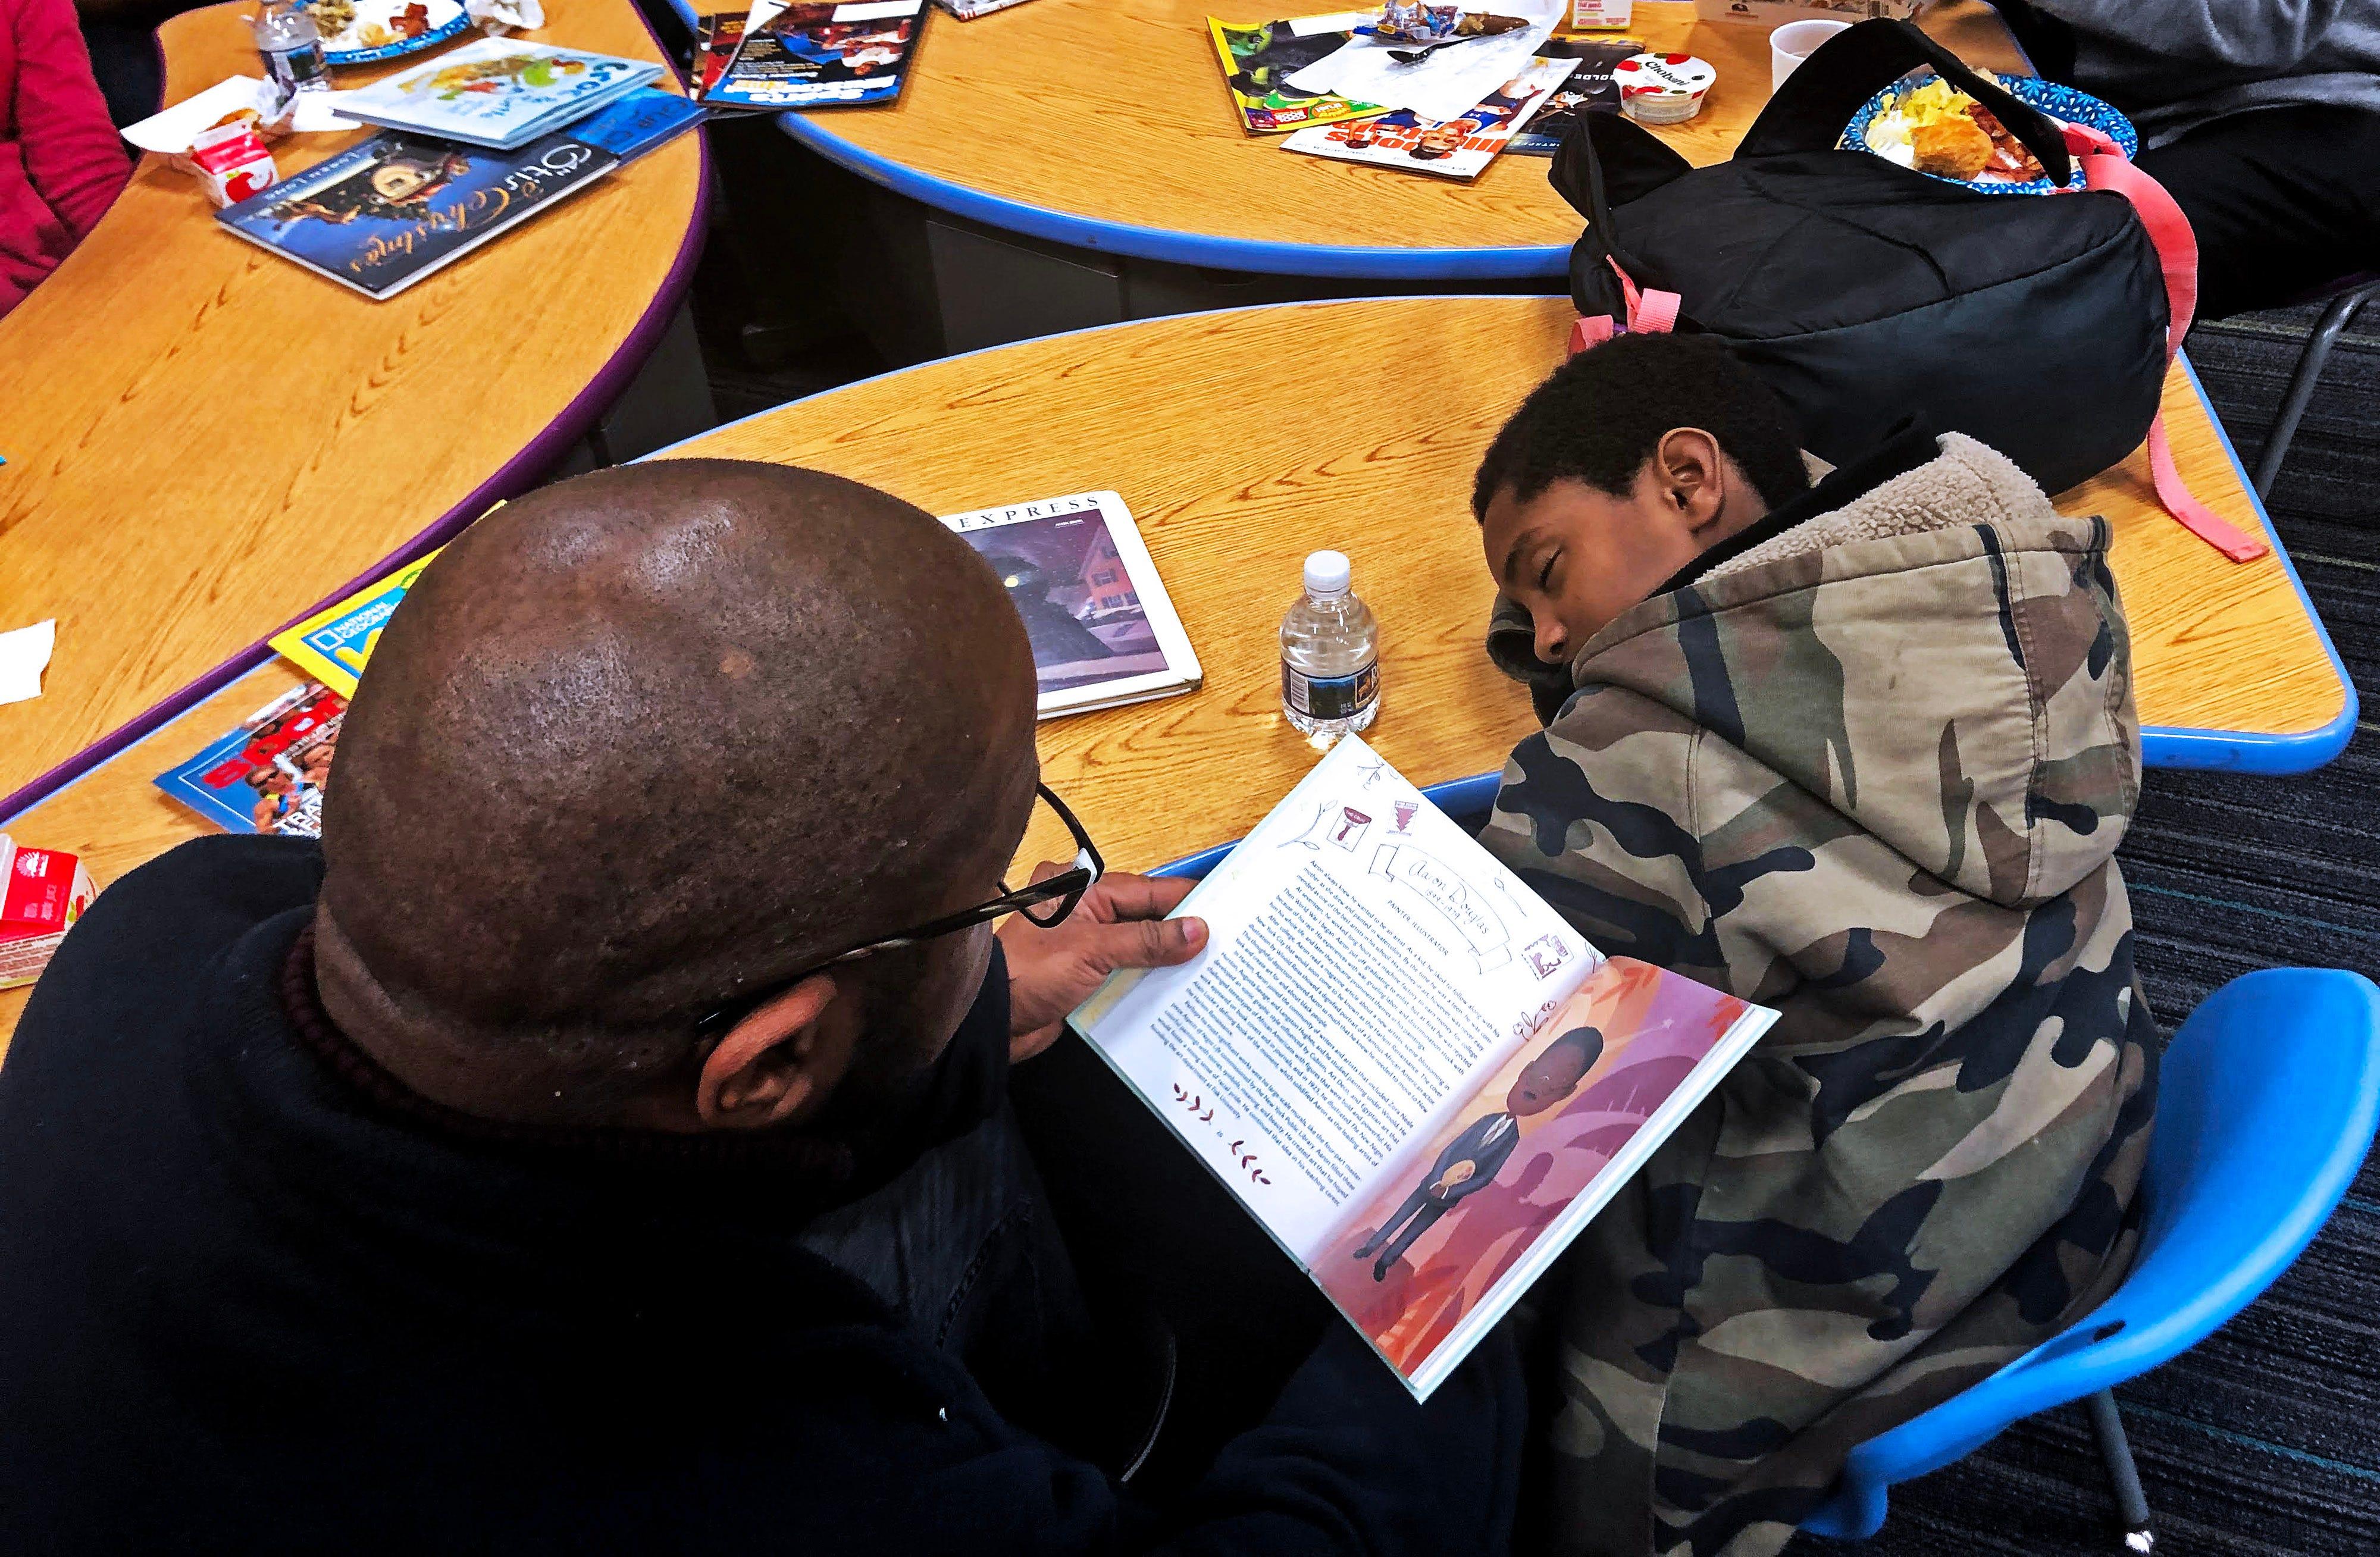 Carlton Atkins, 47, reads to David Nathan at Buena Vista Elementary School in Nashville, Tennessee.